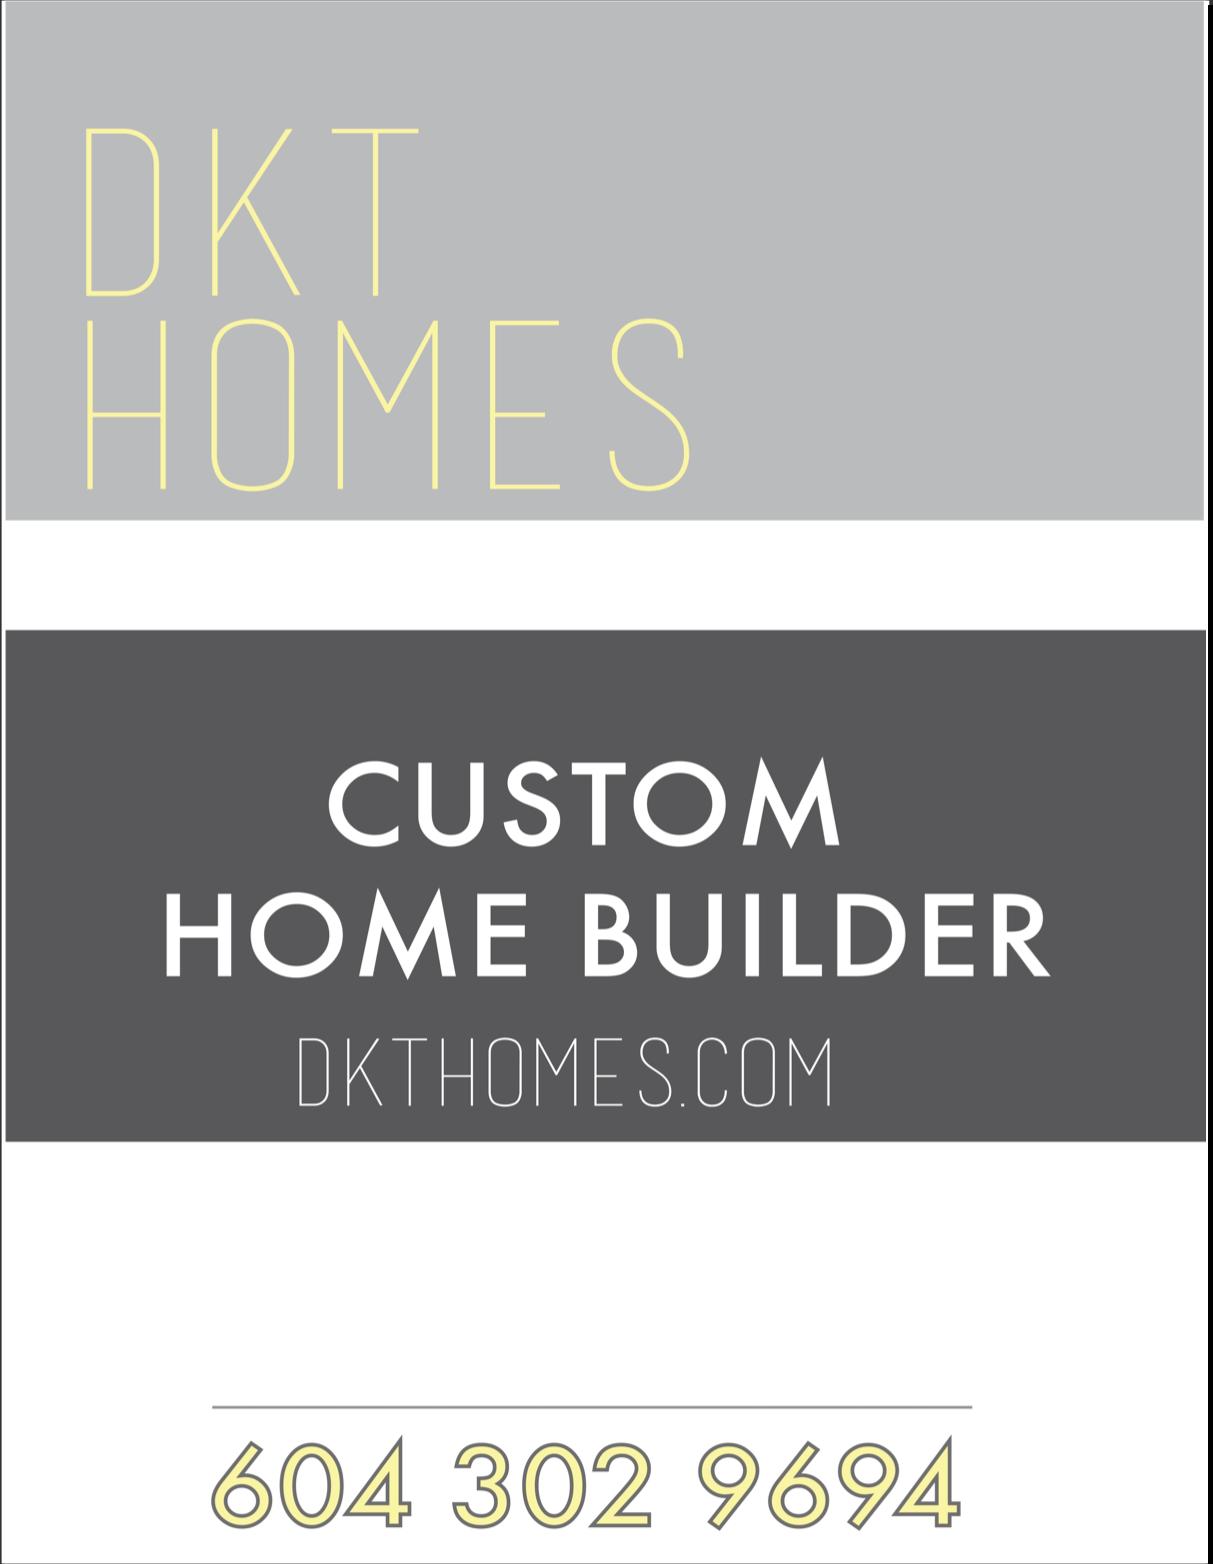 DKT Homes Lawn Sign